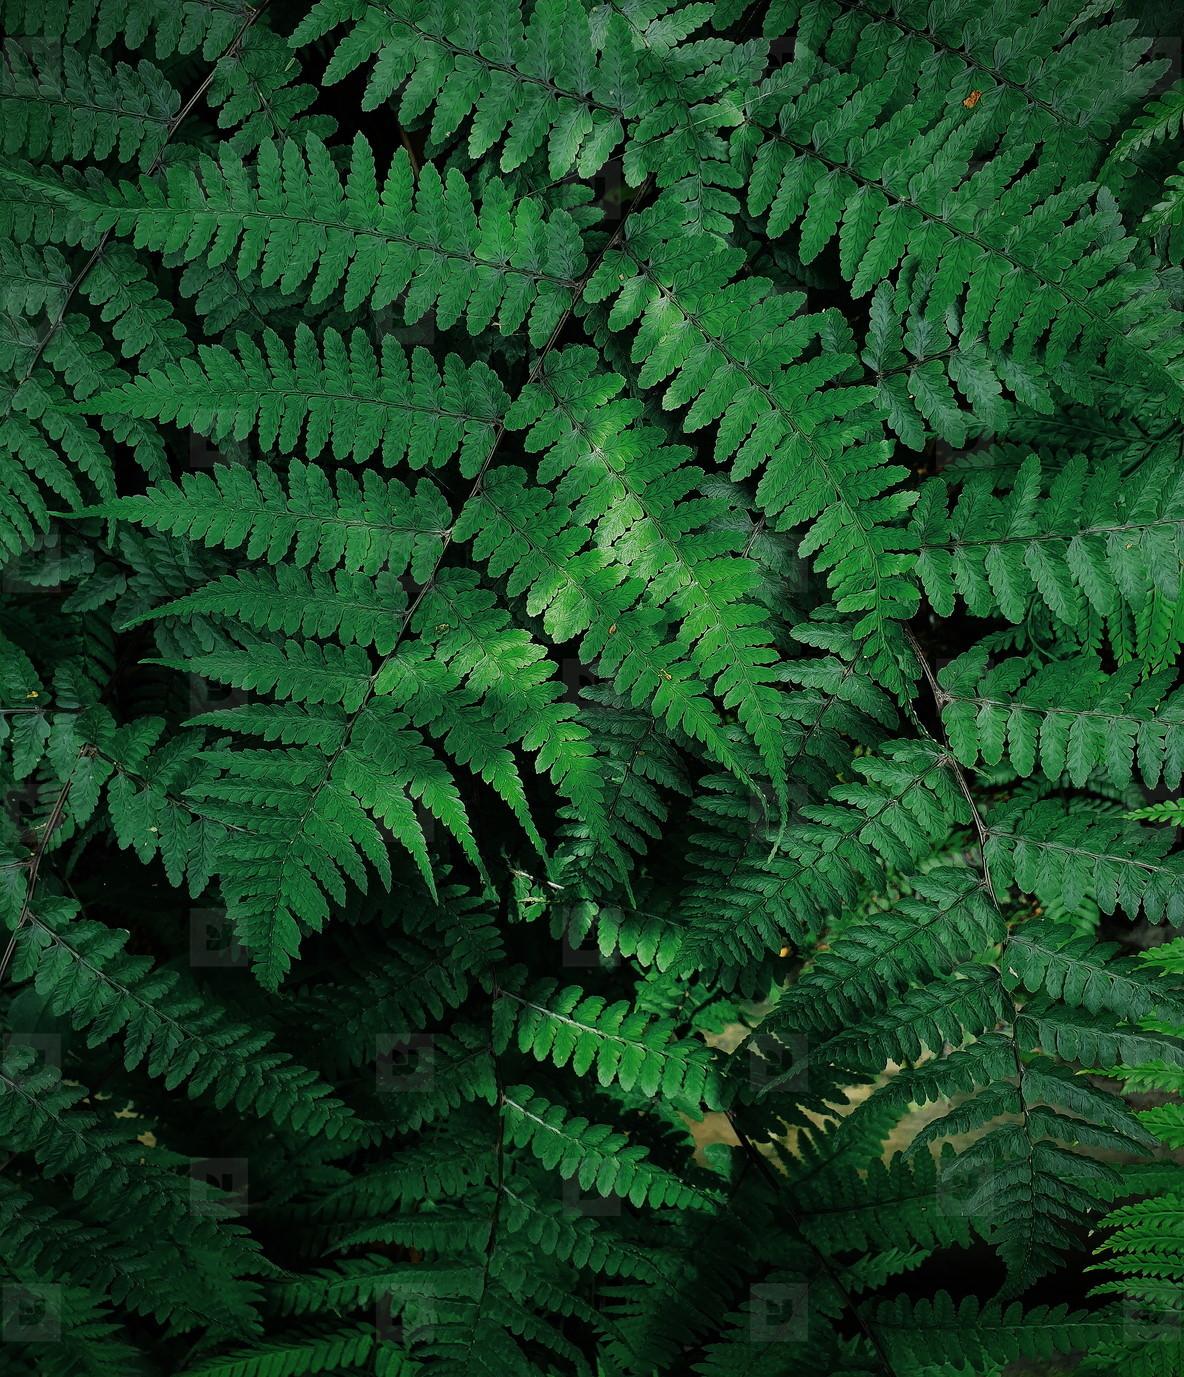 Natural green fern leaves